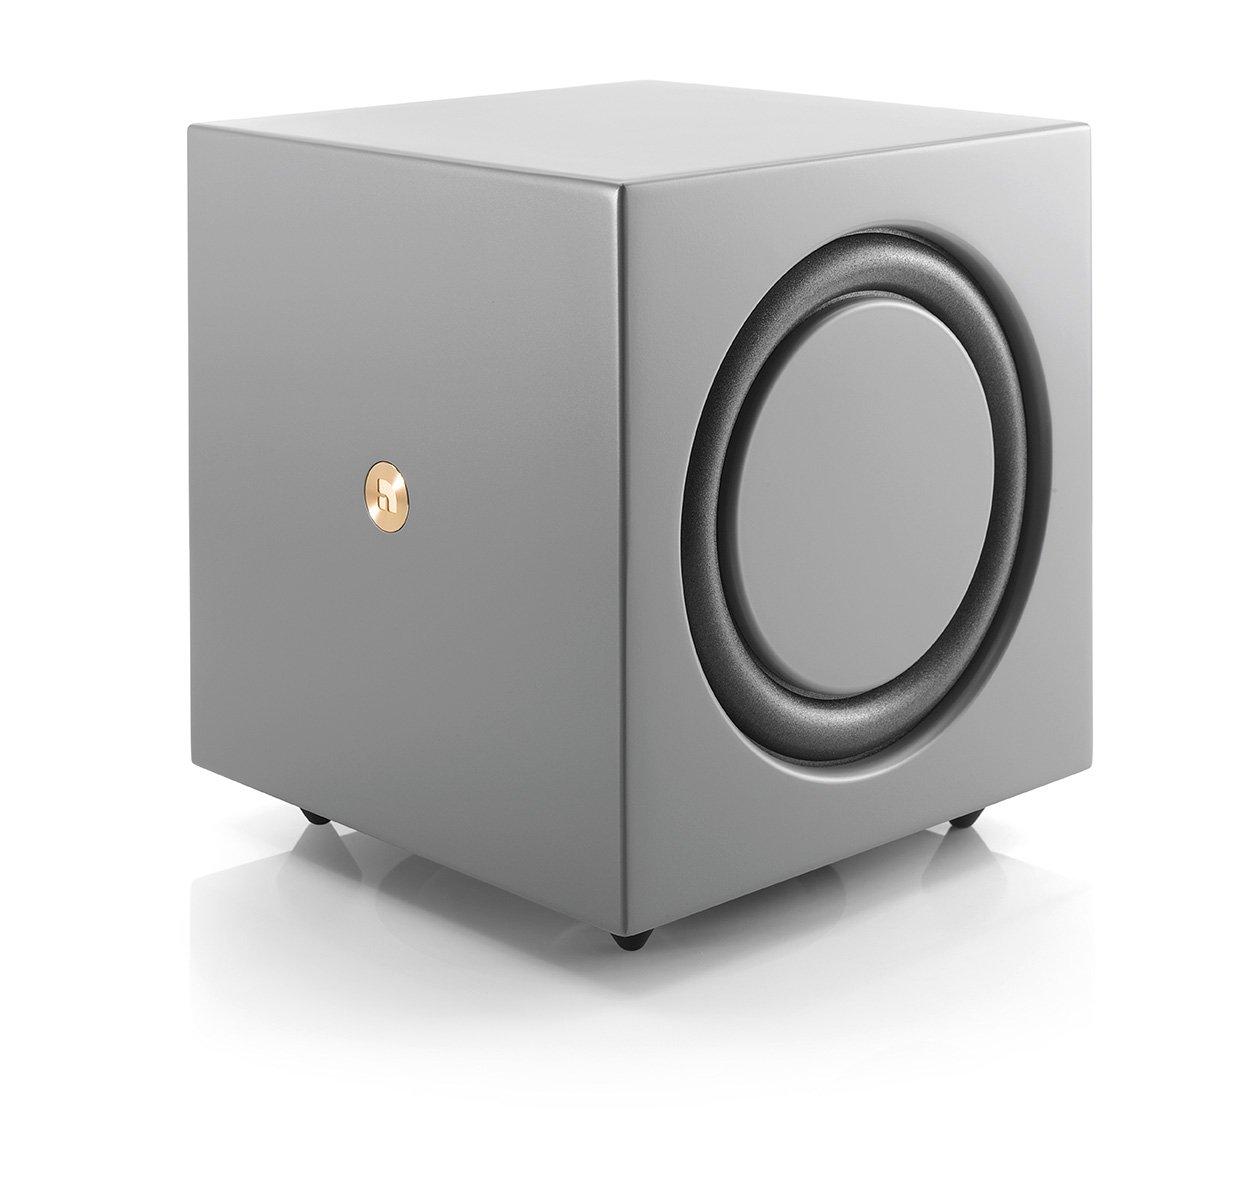 Audio Pro Addon C-SUB WiFi Wireless Multi-Room Subwoofer - Powerful Bass - Works With Alexa - Grey